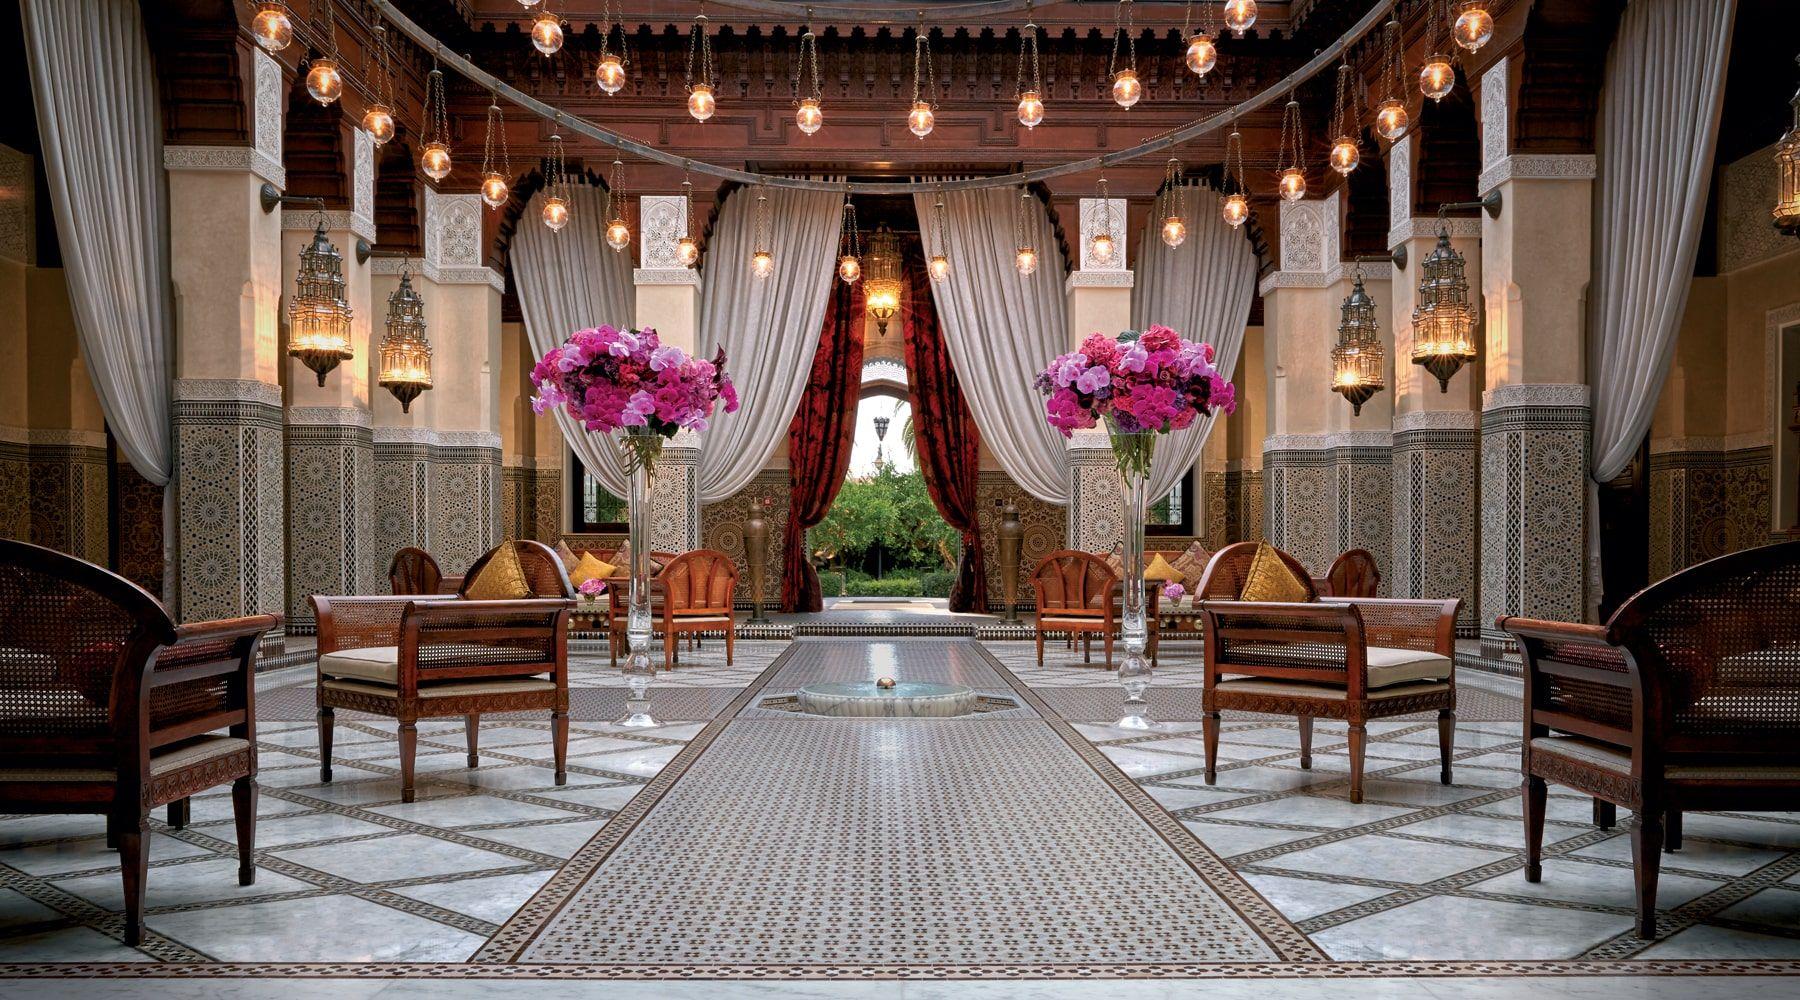 The 5-star Royal Mansour Marrakech